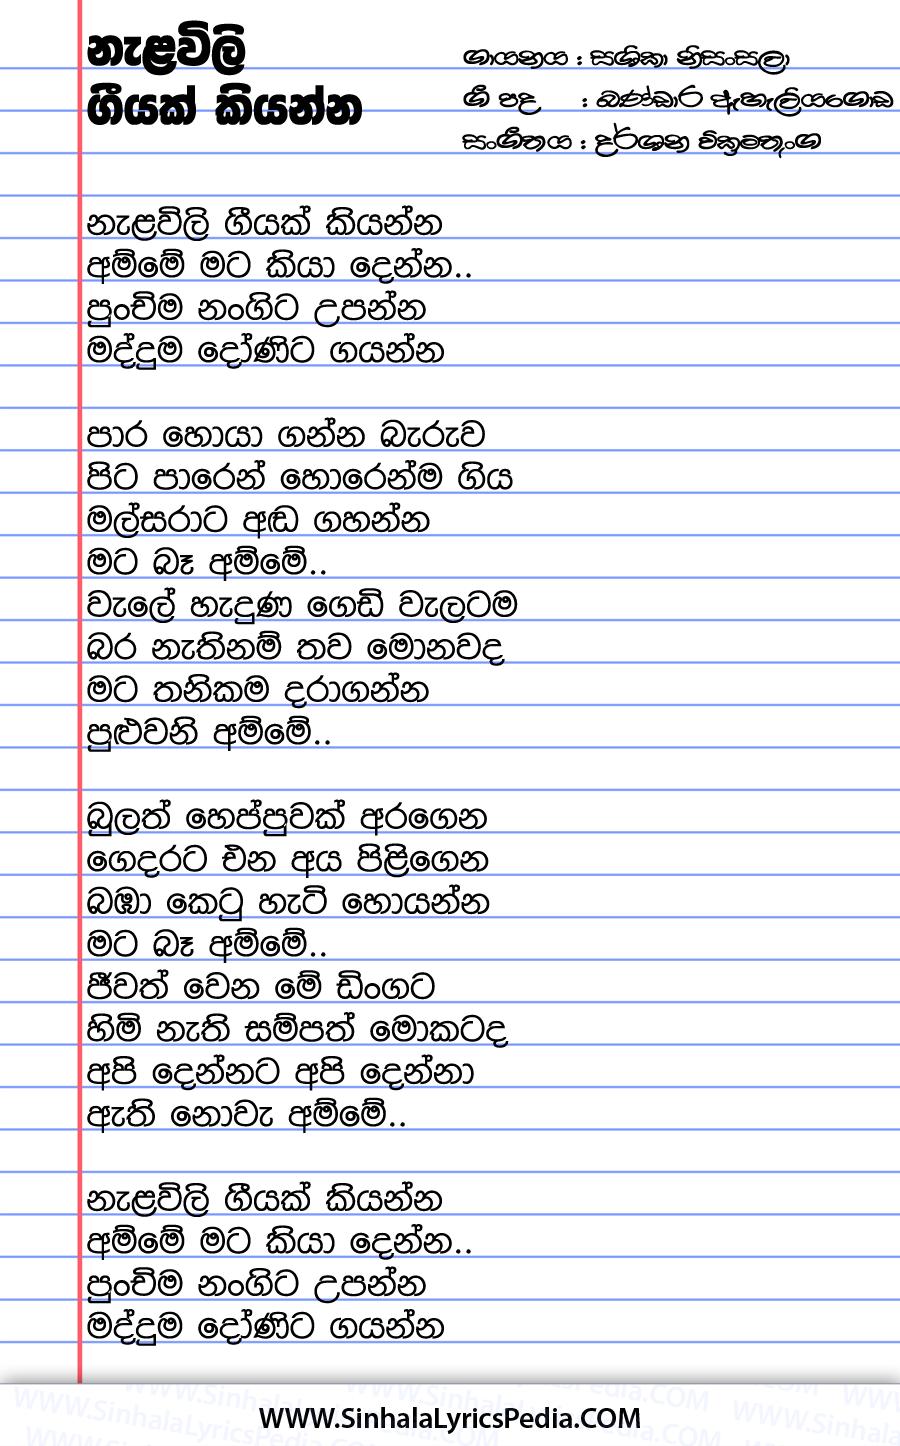 Nalawili Geeyak Kiyanna Song Lyrics